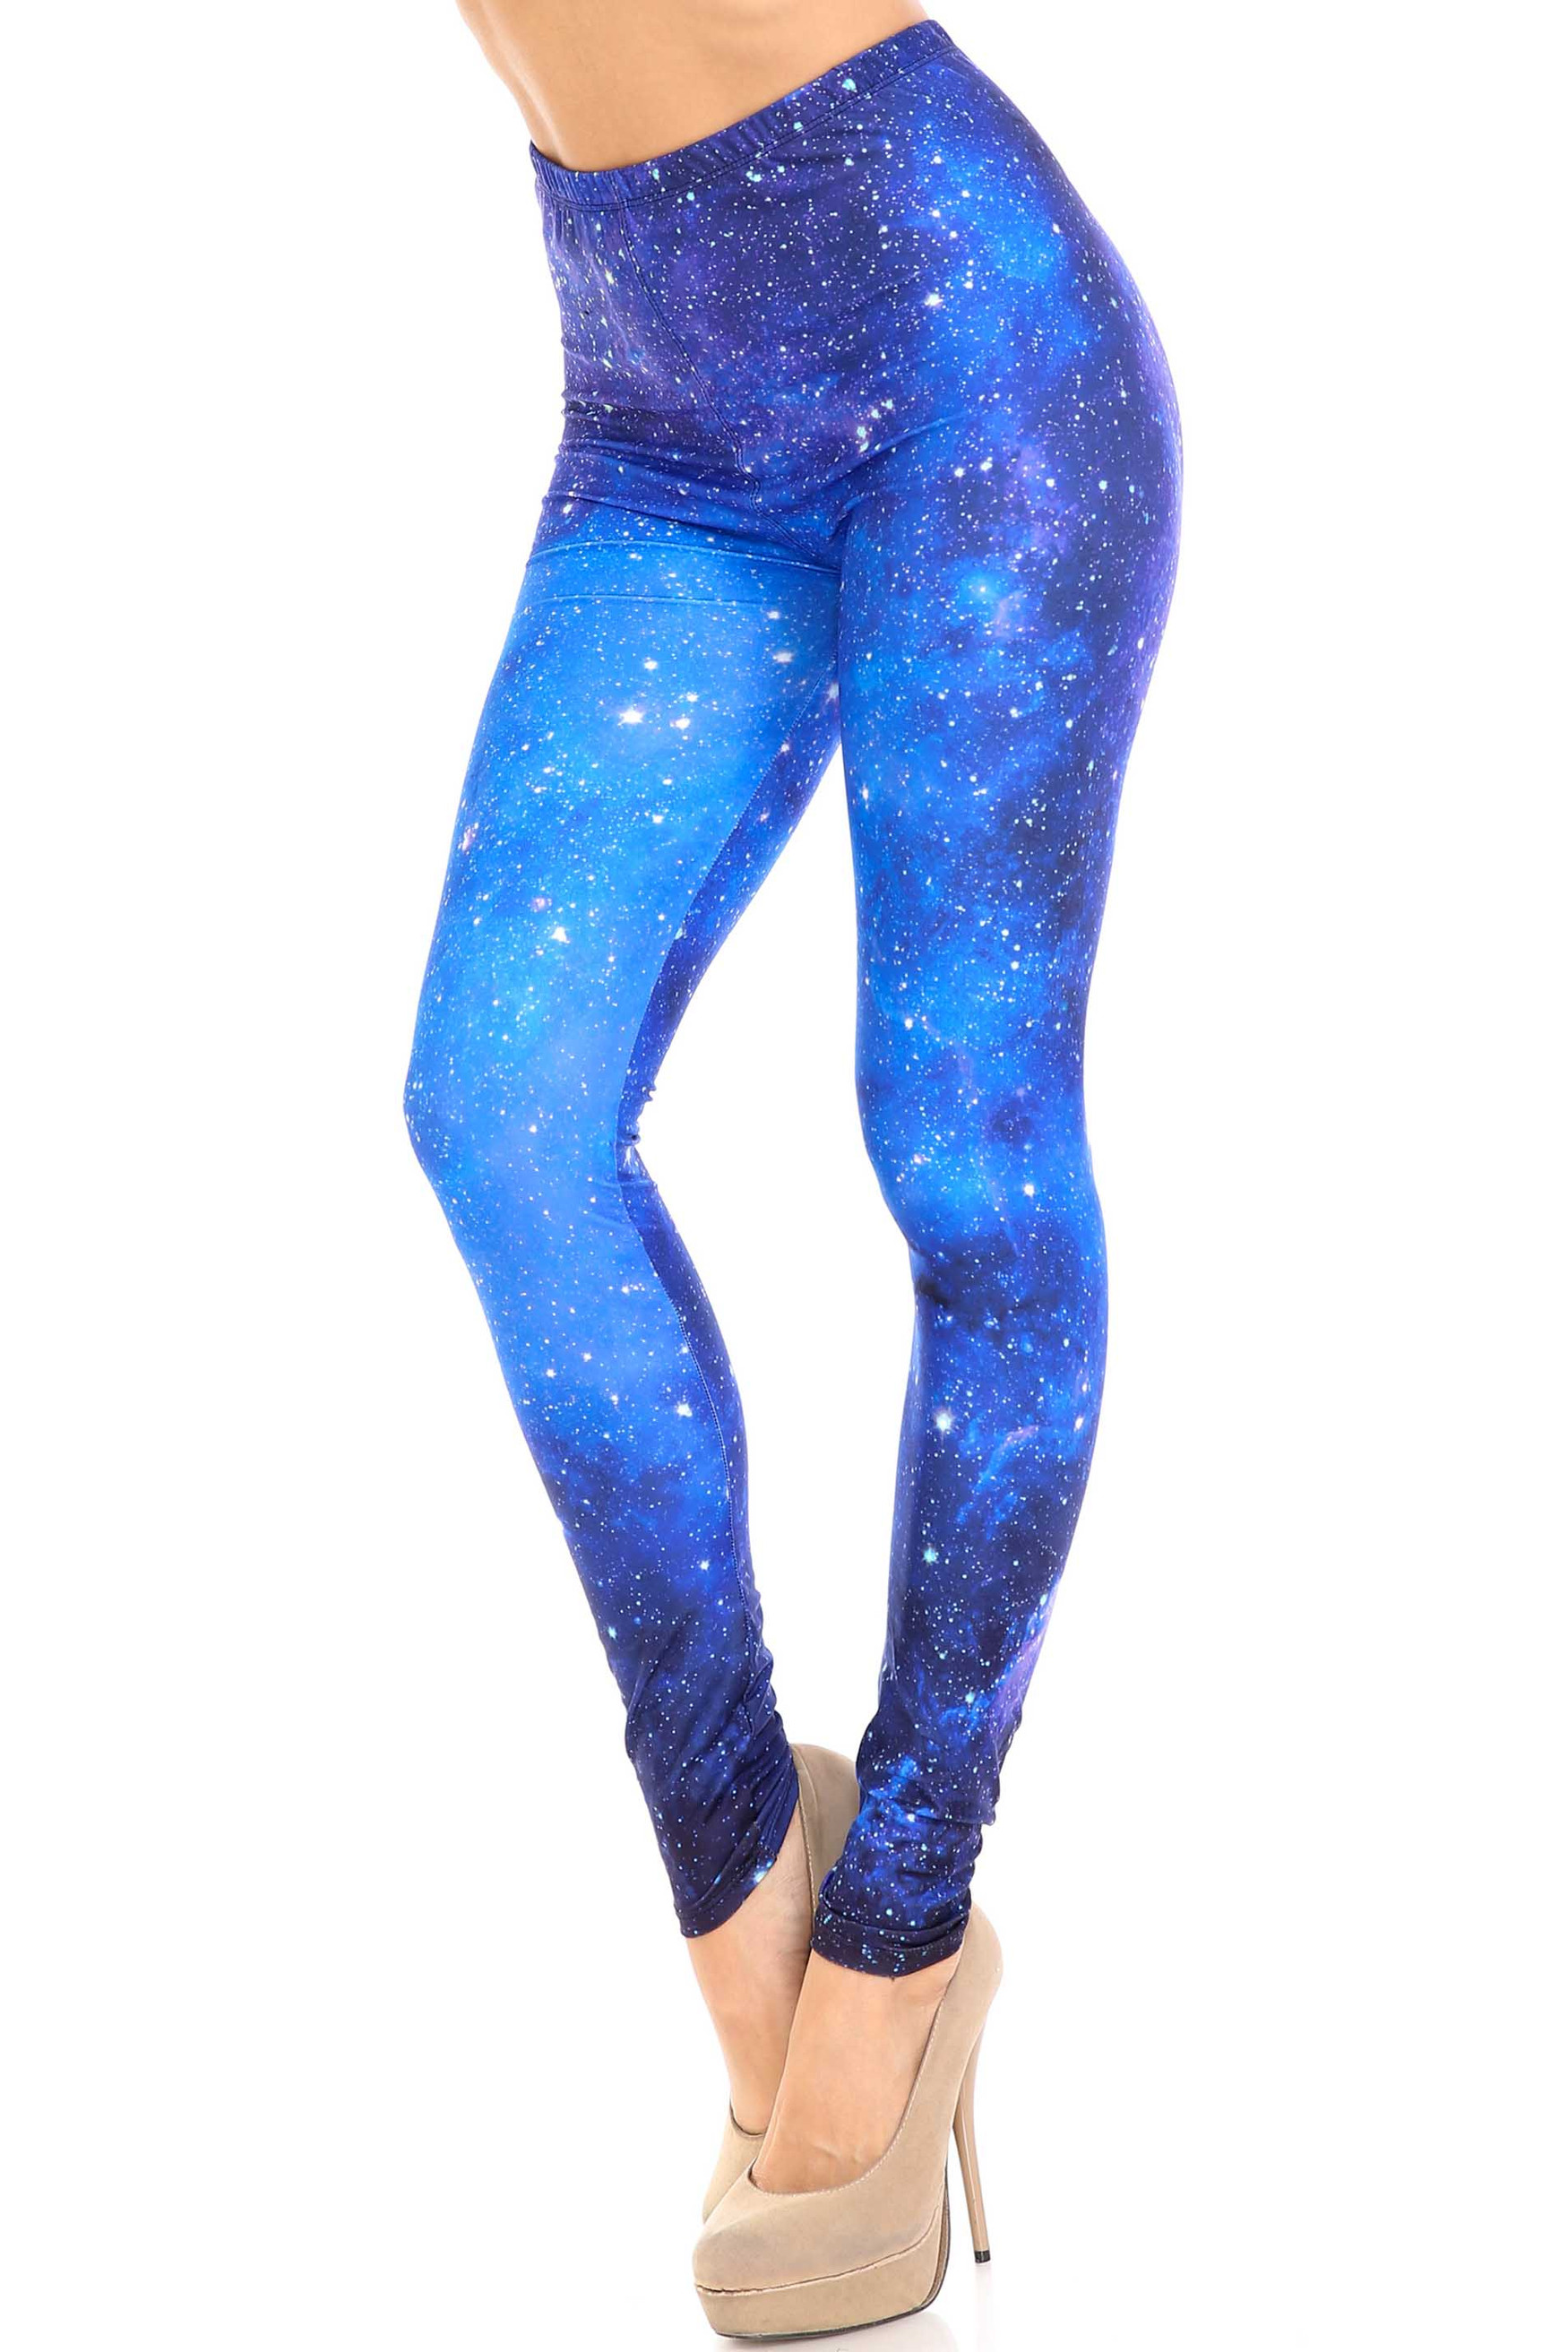 Creamy Soft Deep Blue Galaxy Extra Plus Size Leggings - 3X-5X - USA Fashion™